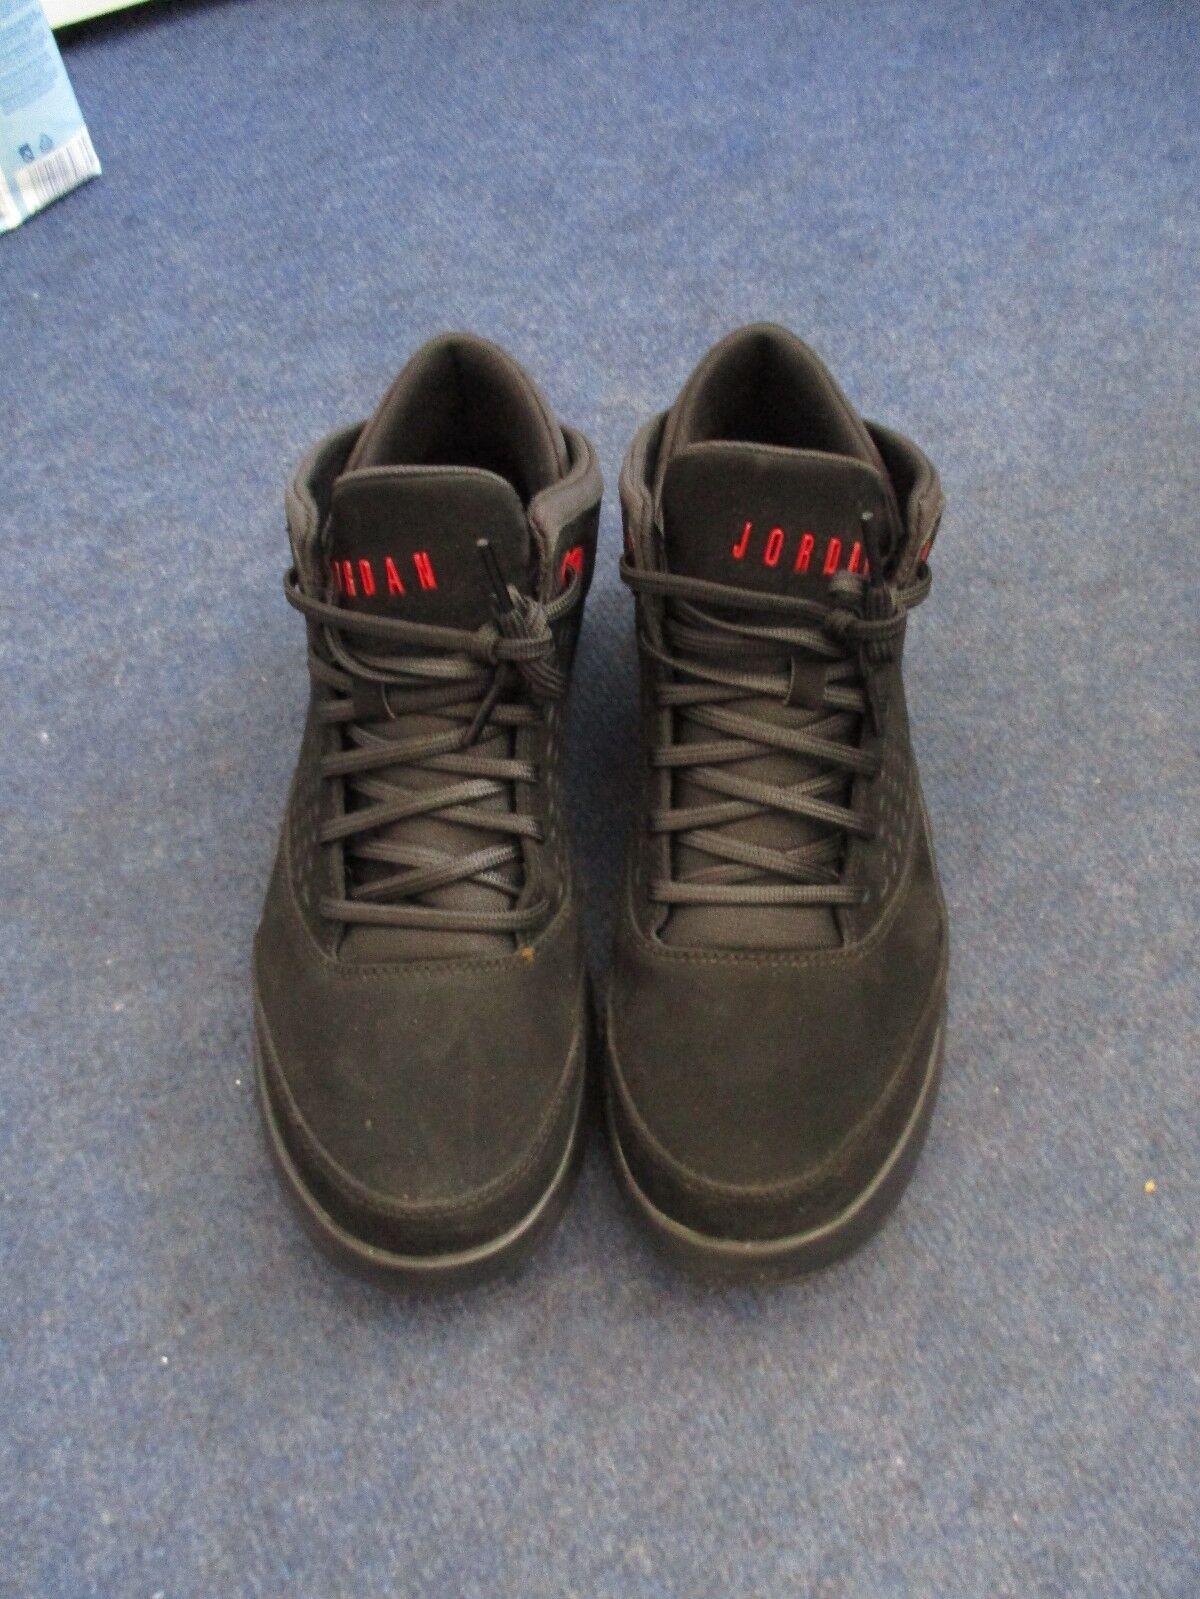 best sneakers 74564 e41bc Nike Air Jordan Flight Origin 4 Air schwarz halbschuhe wie neu Größe 43  e82020